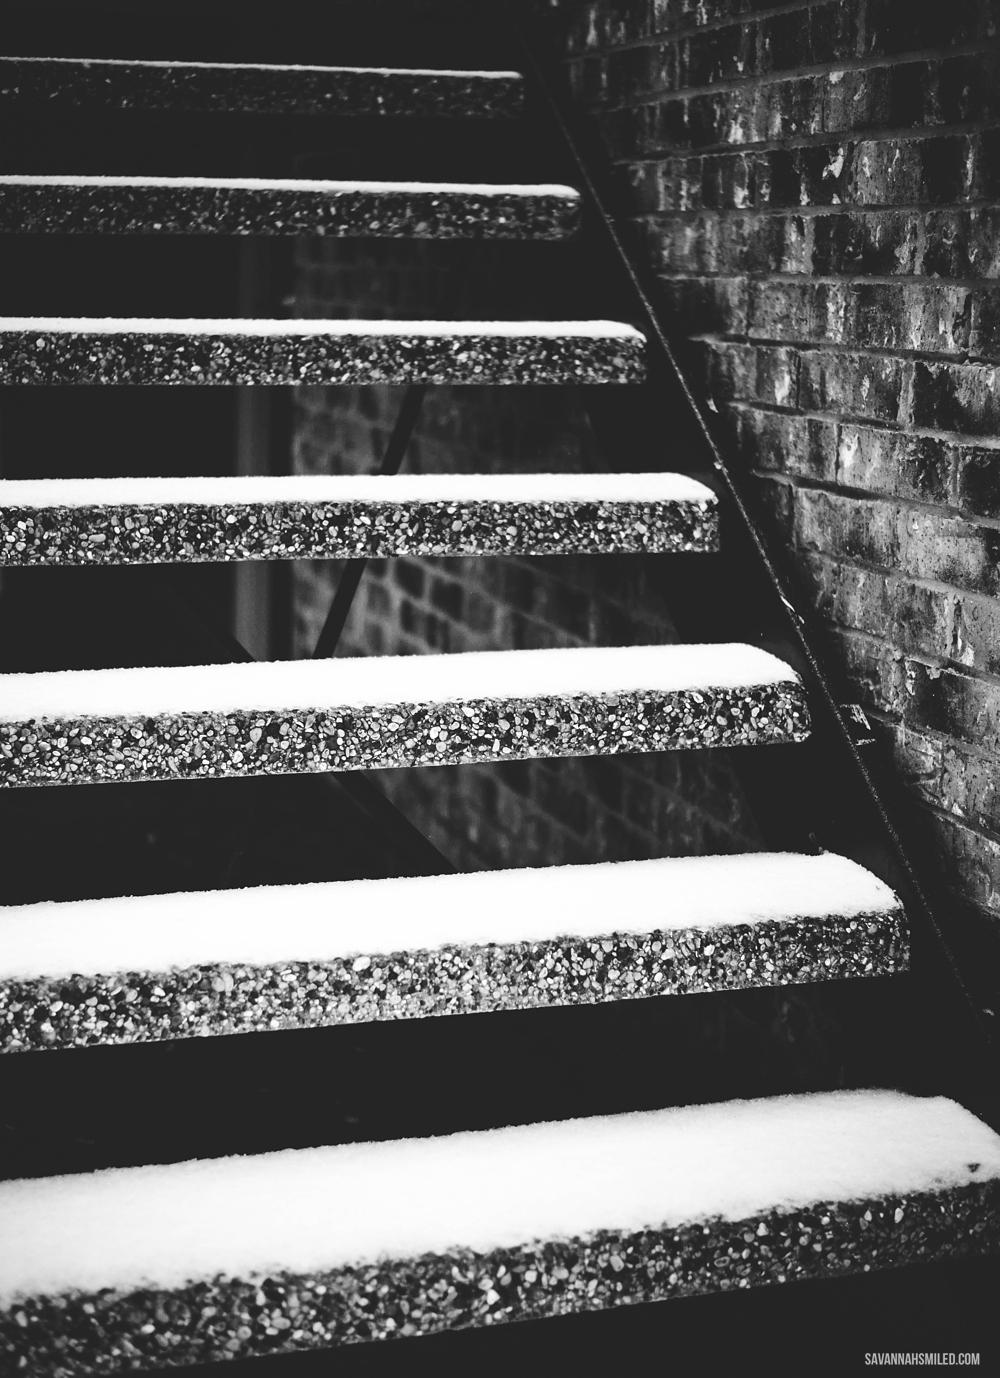 ice-day-weather-dallas-8.jpg